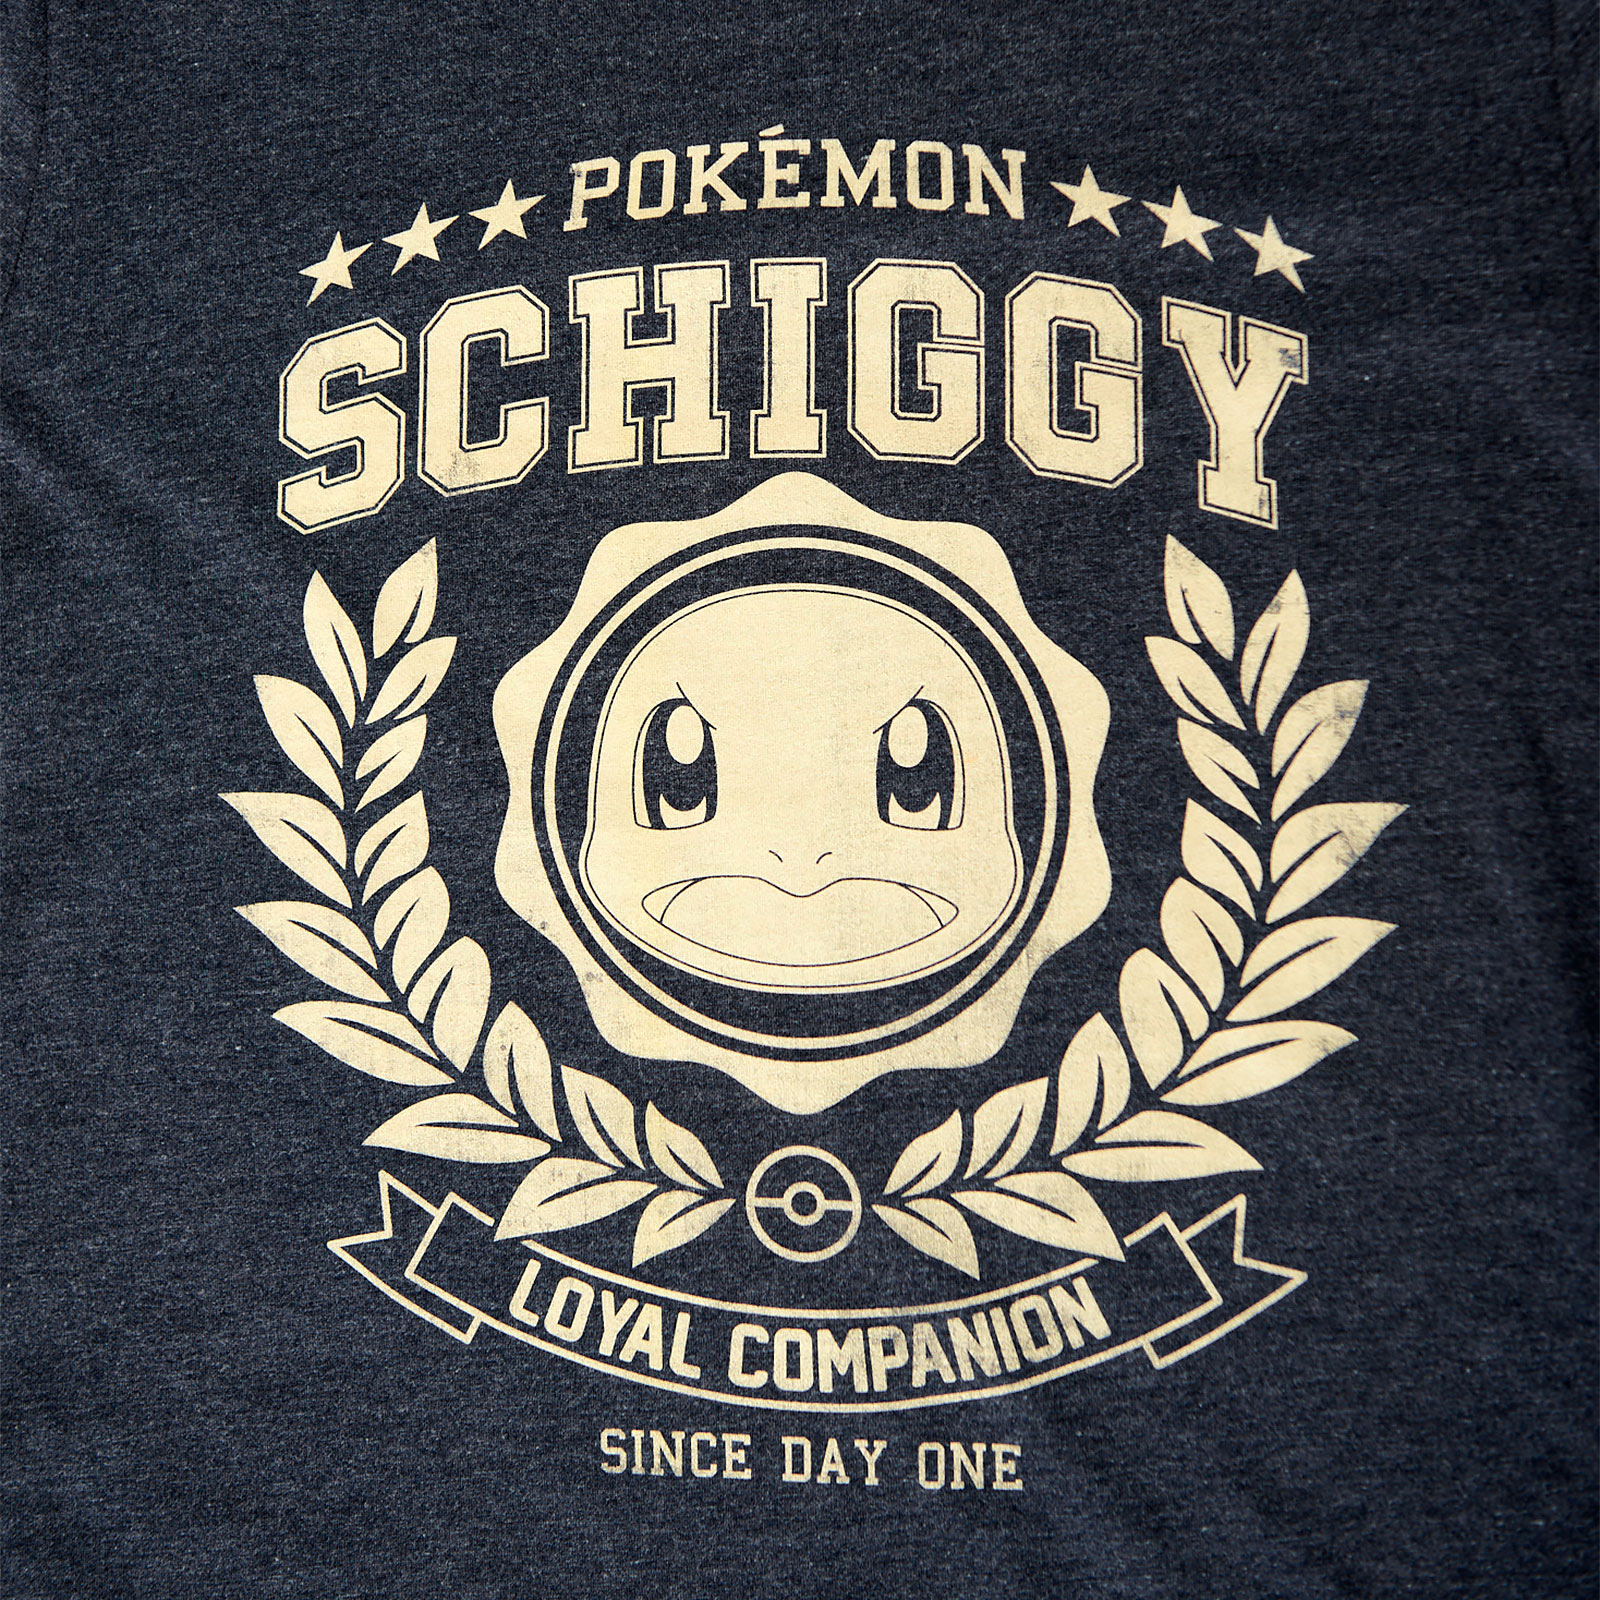 Pokemon - Schiggy Loyal Companion T-Shirt blau